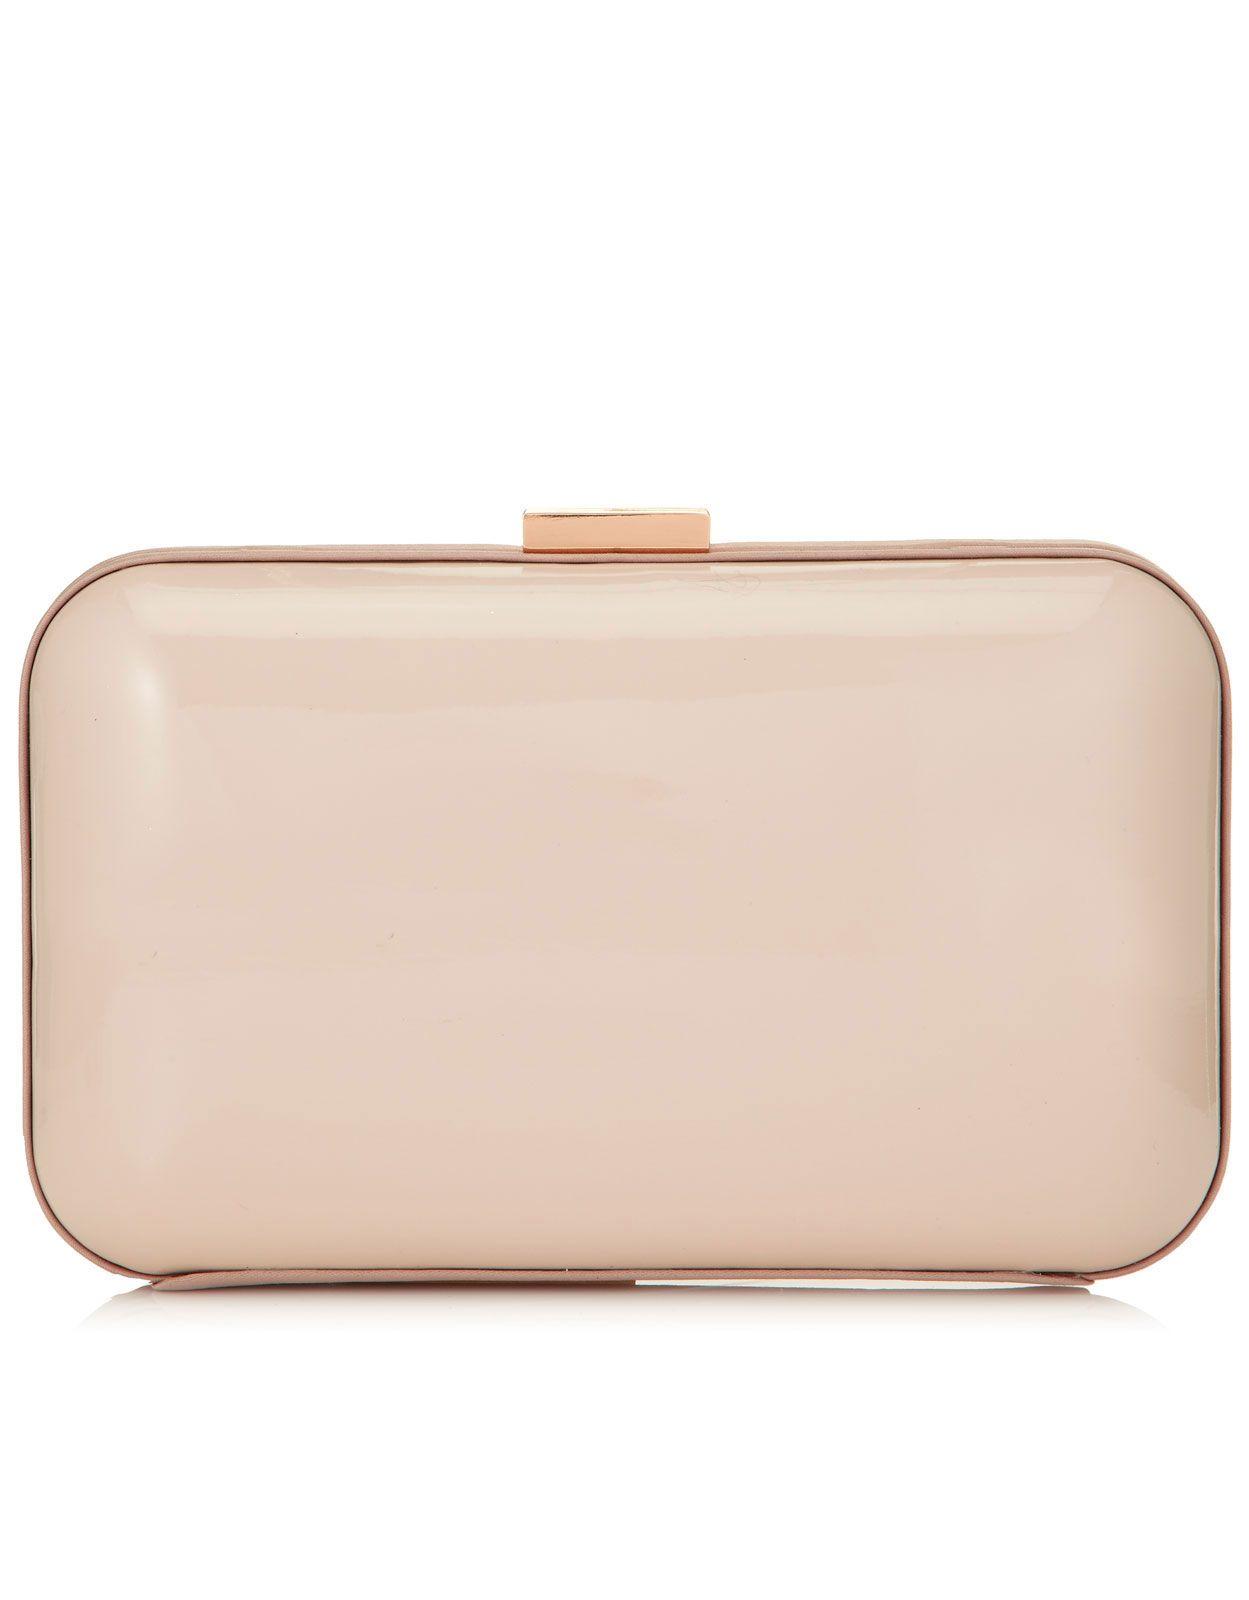 Satin Trim Patent Hardcase Clutch Bag